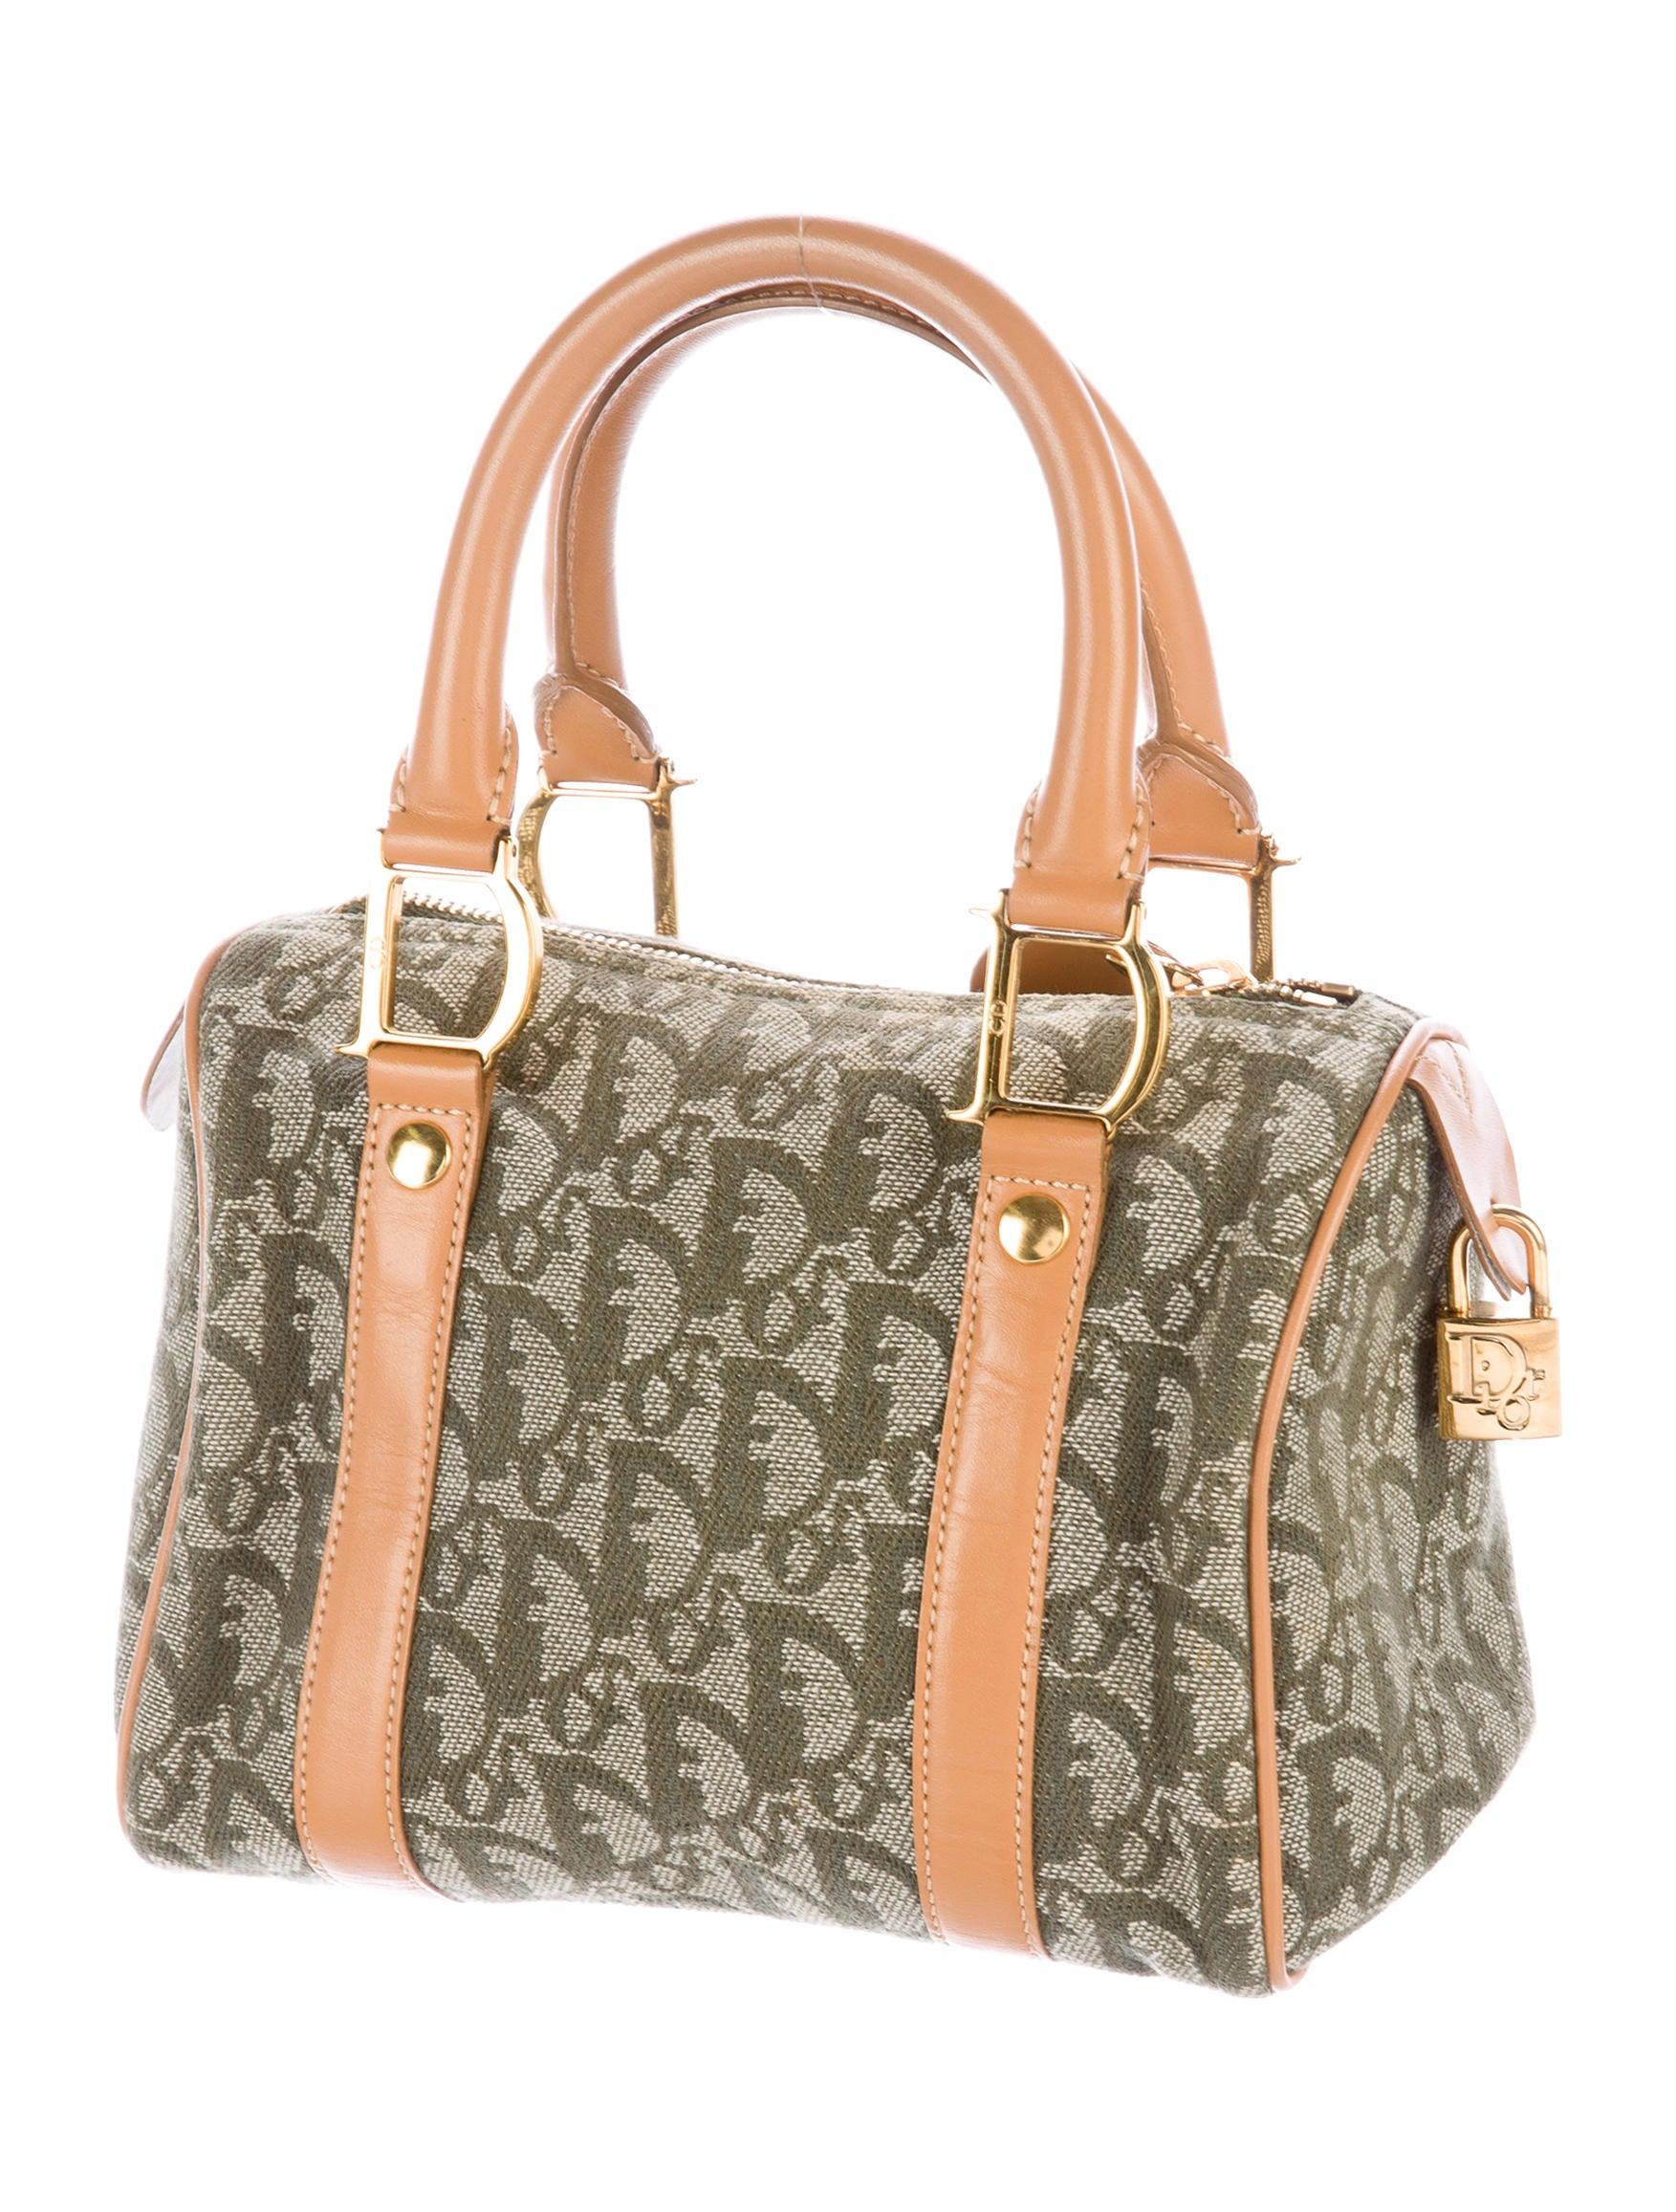 Boston Bag Patchwork Tutorial: Christian Dior Mini Diorissimo Boston Bag